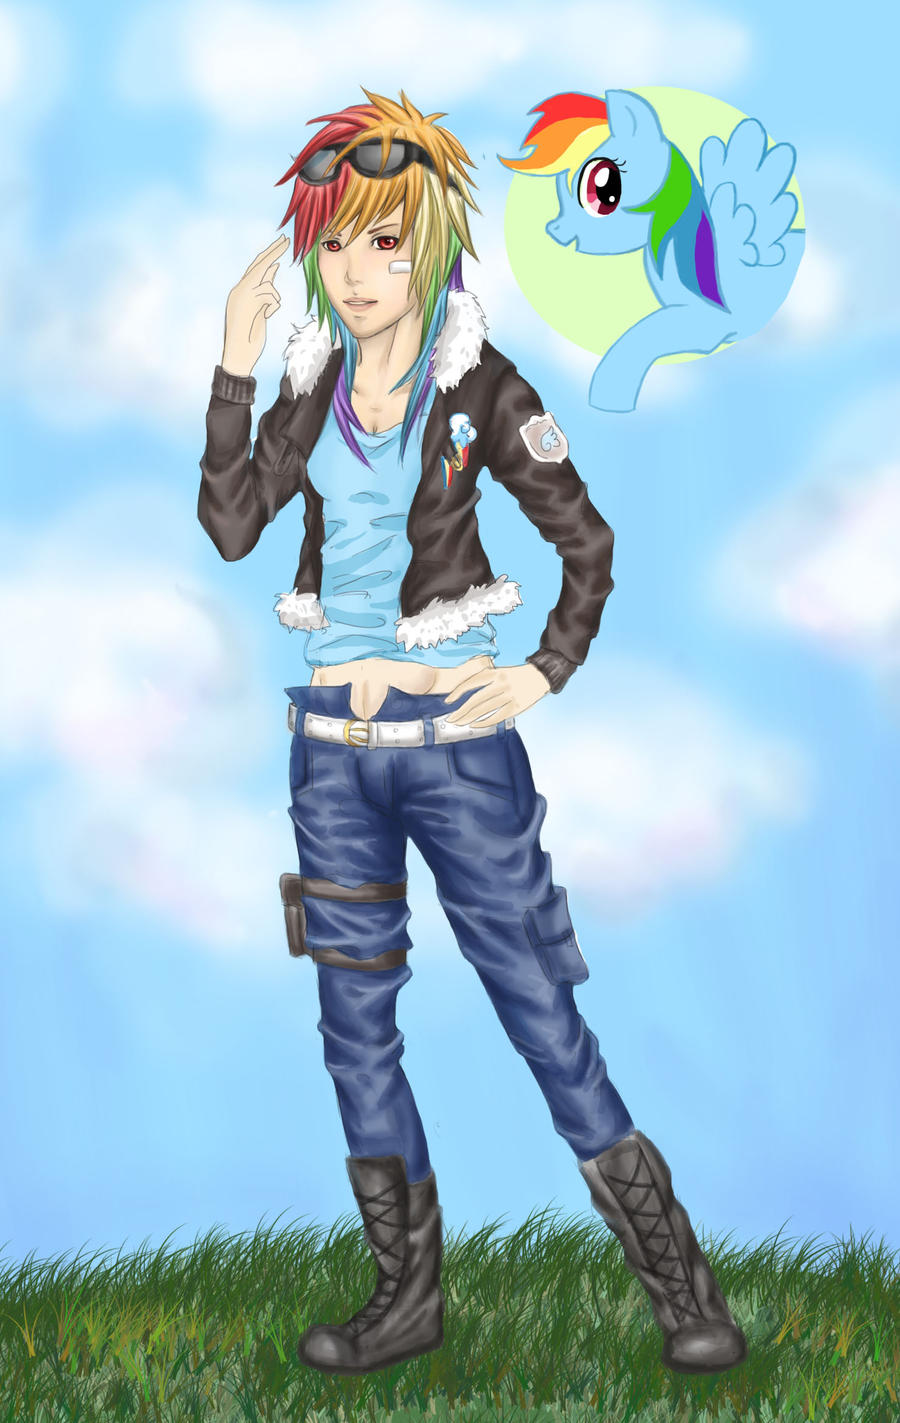 Rainbow Dash as a Human in Real Life Human Rainbow Dash by